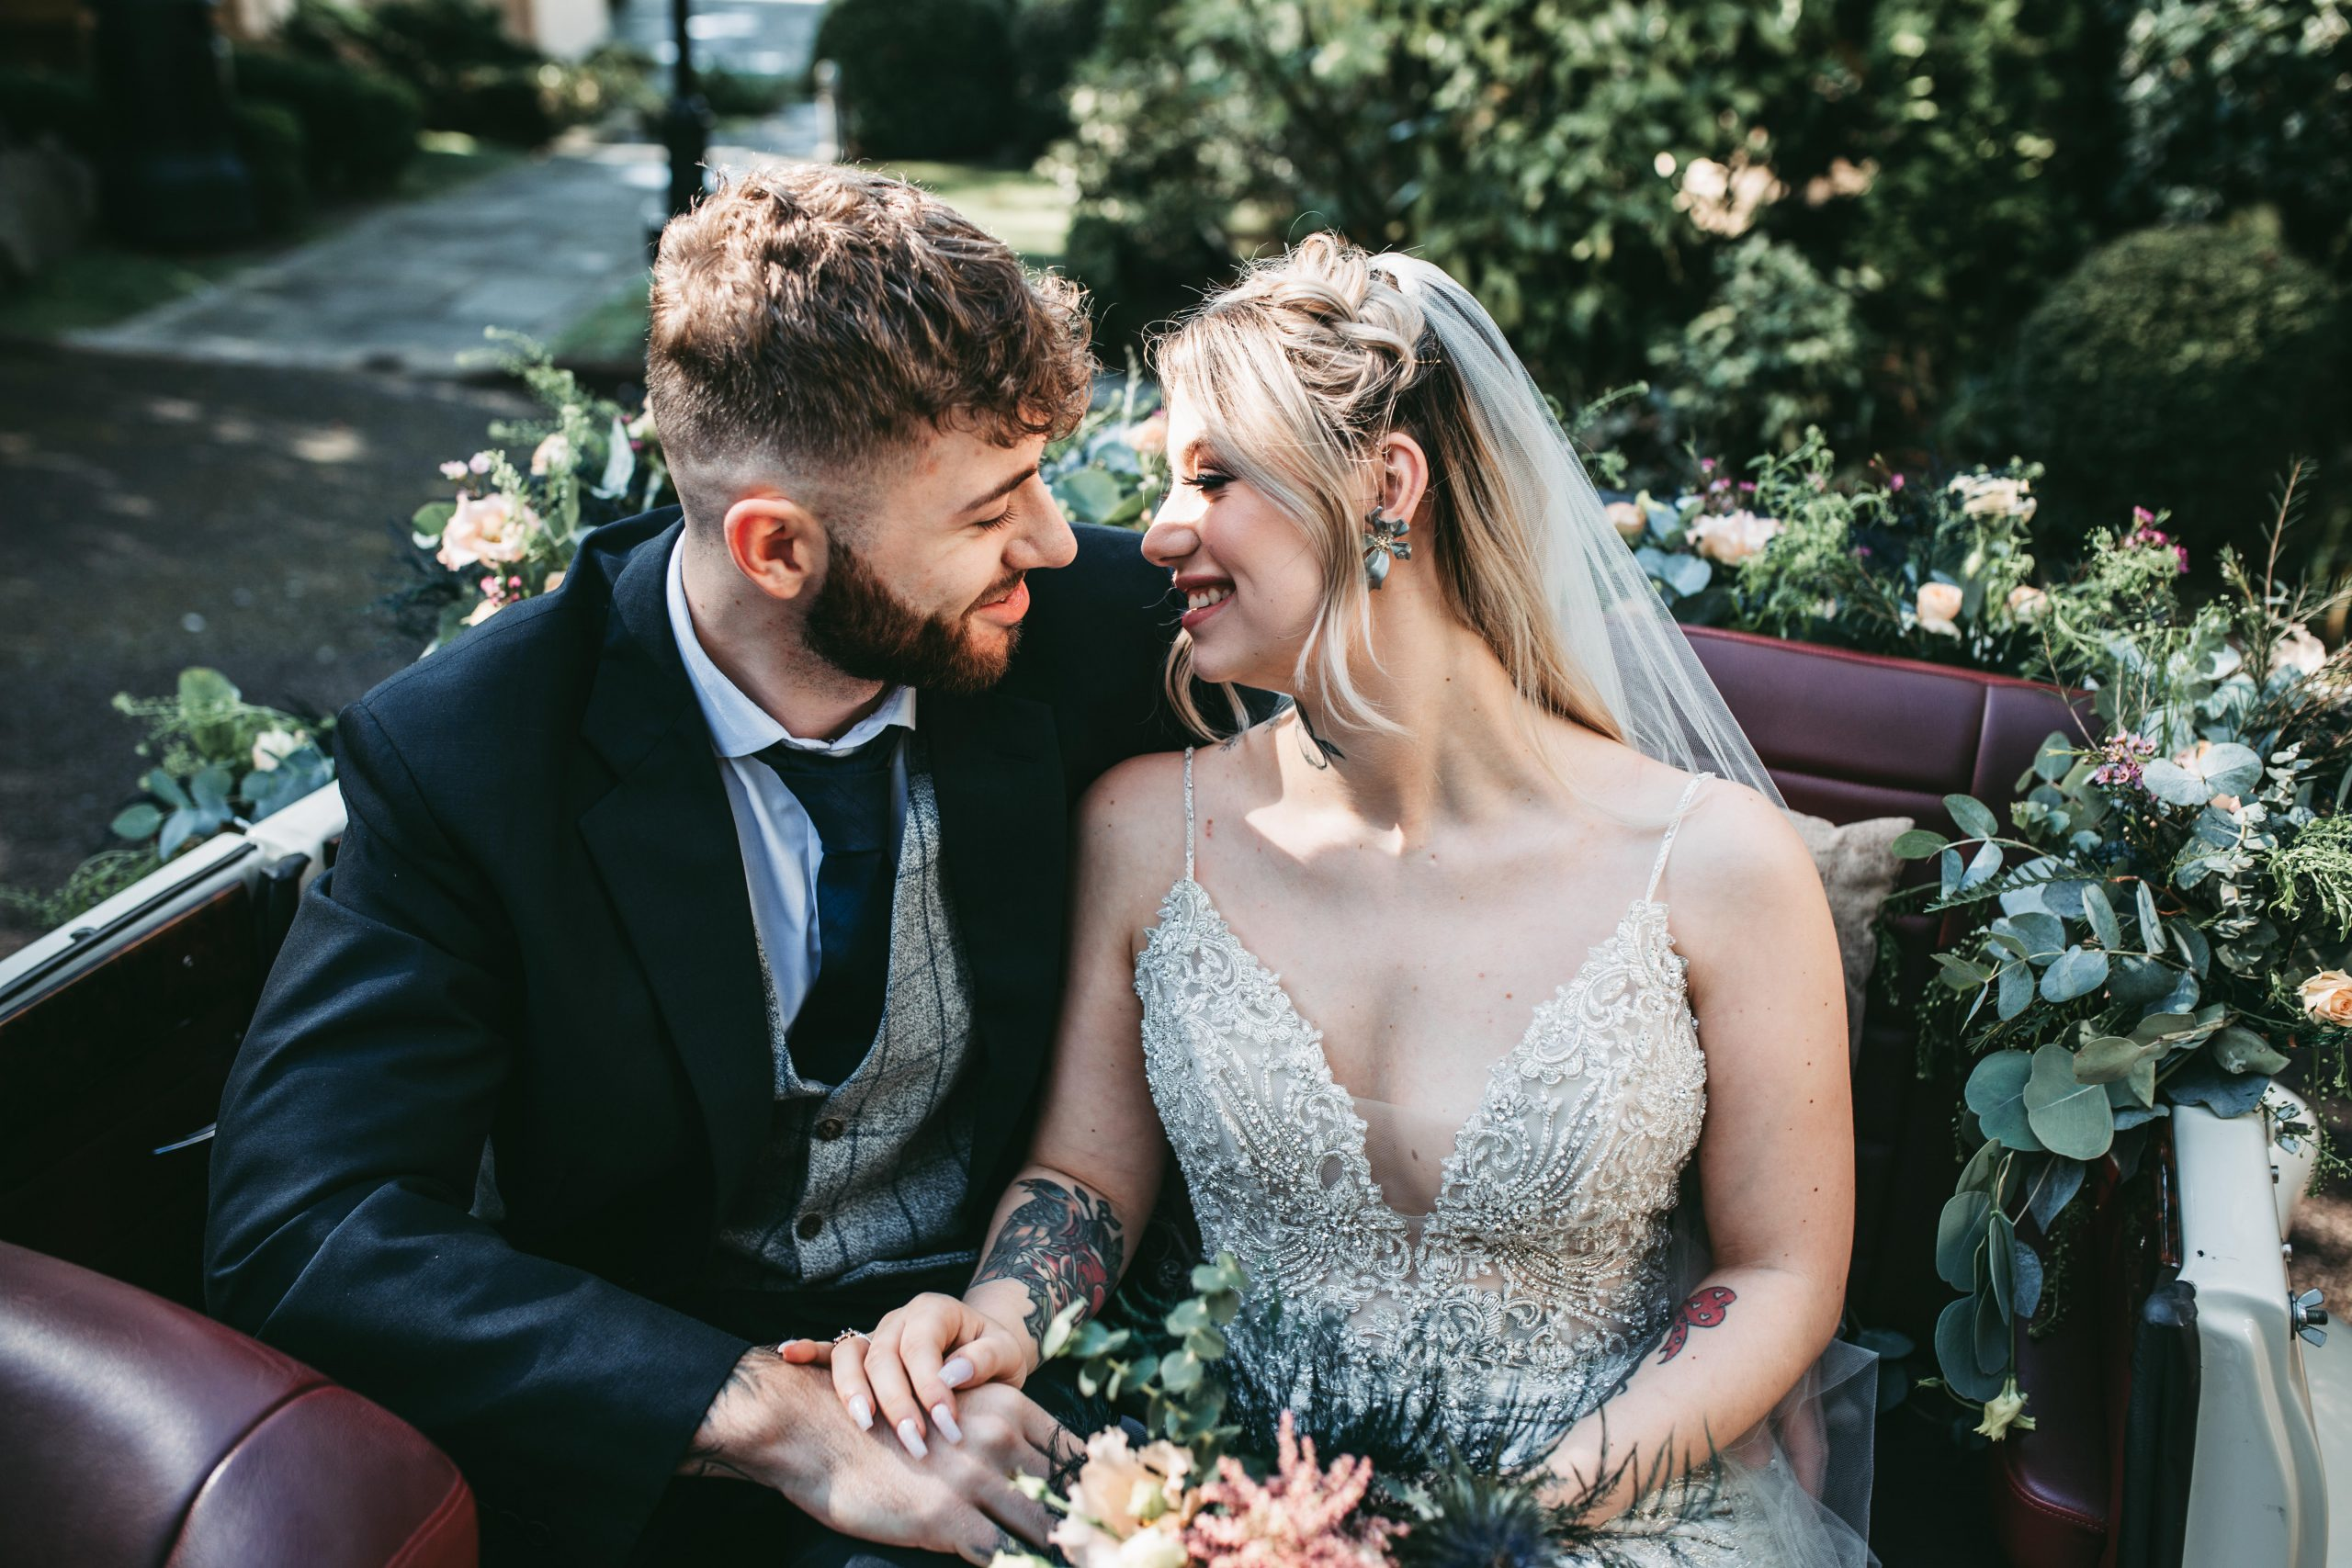 bride and groom sat inside kingfisher wedding car